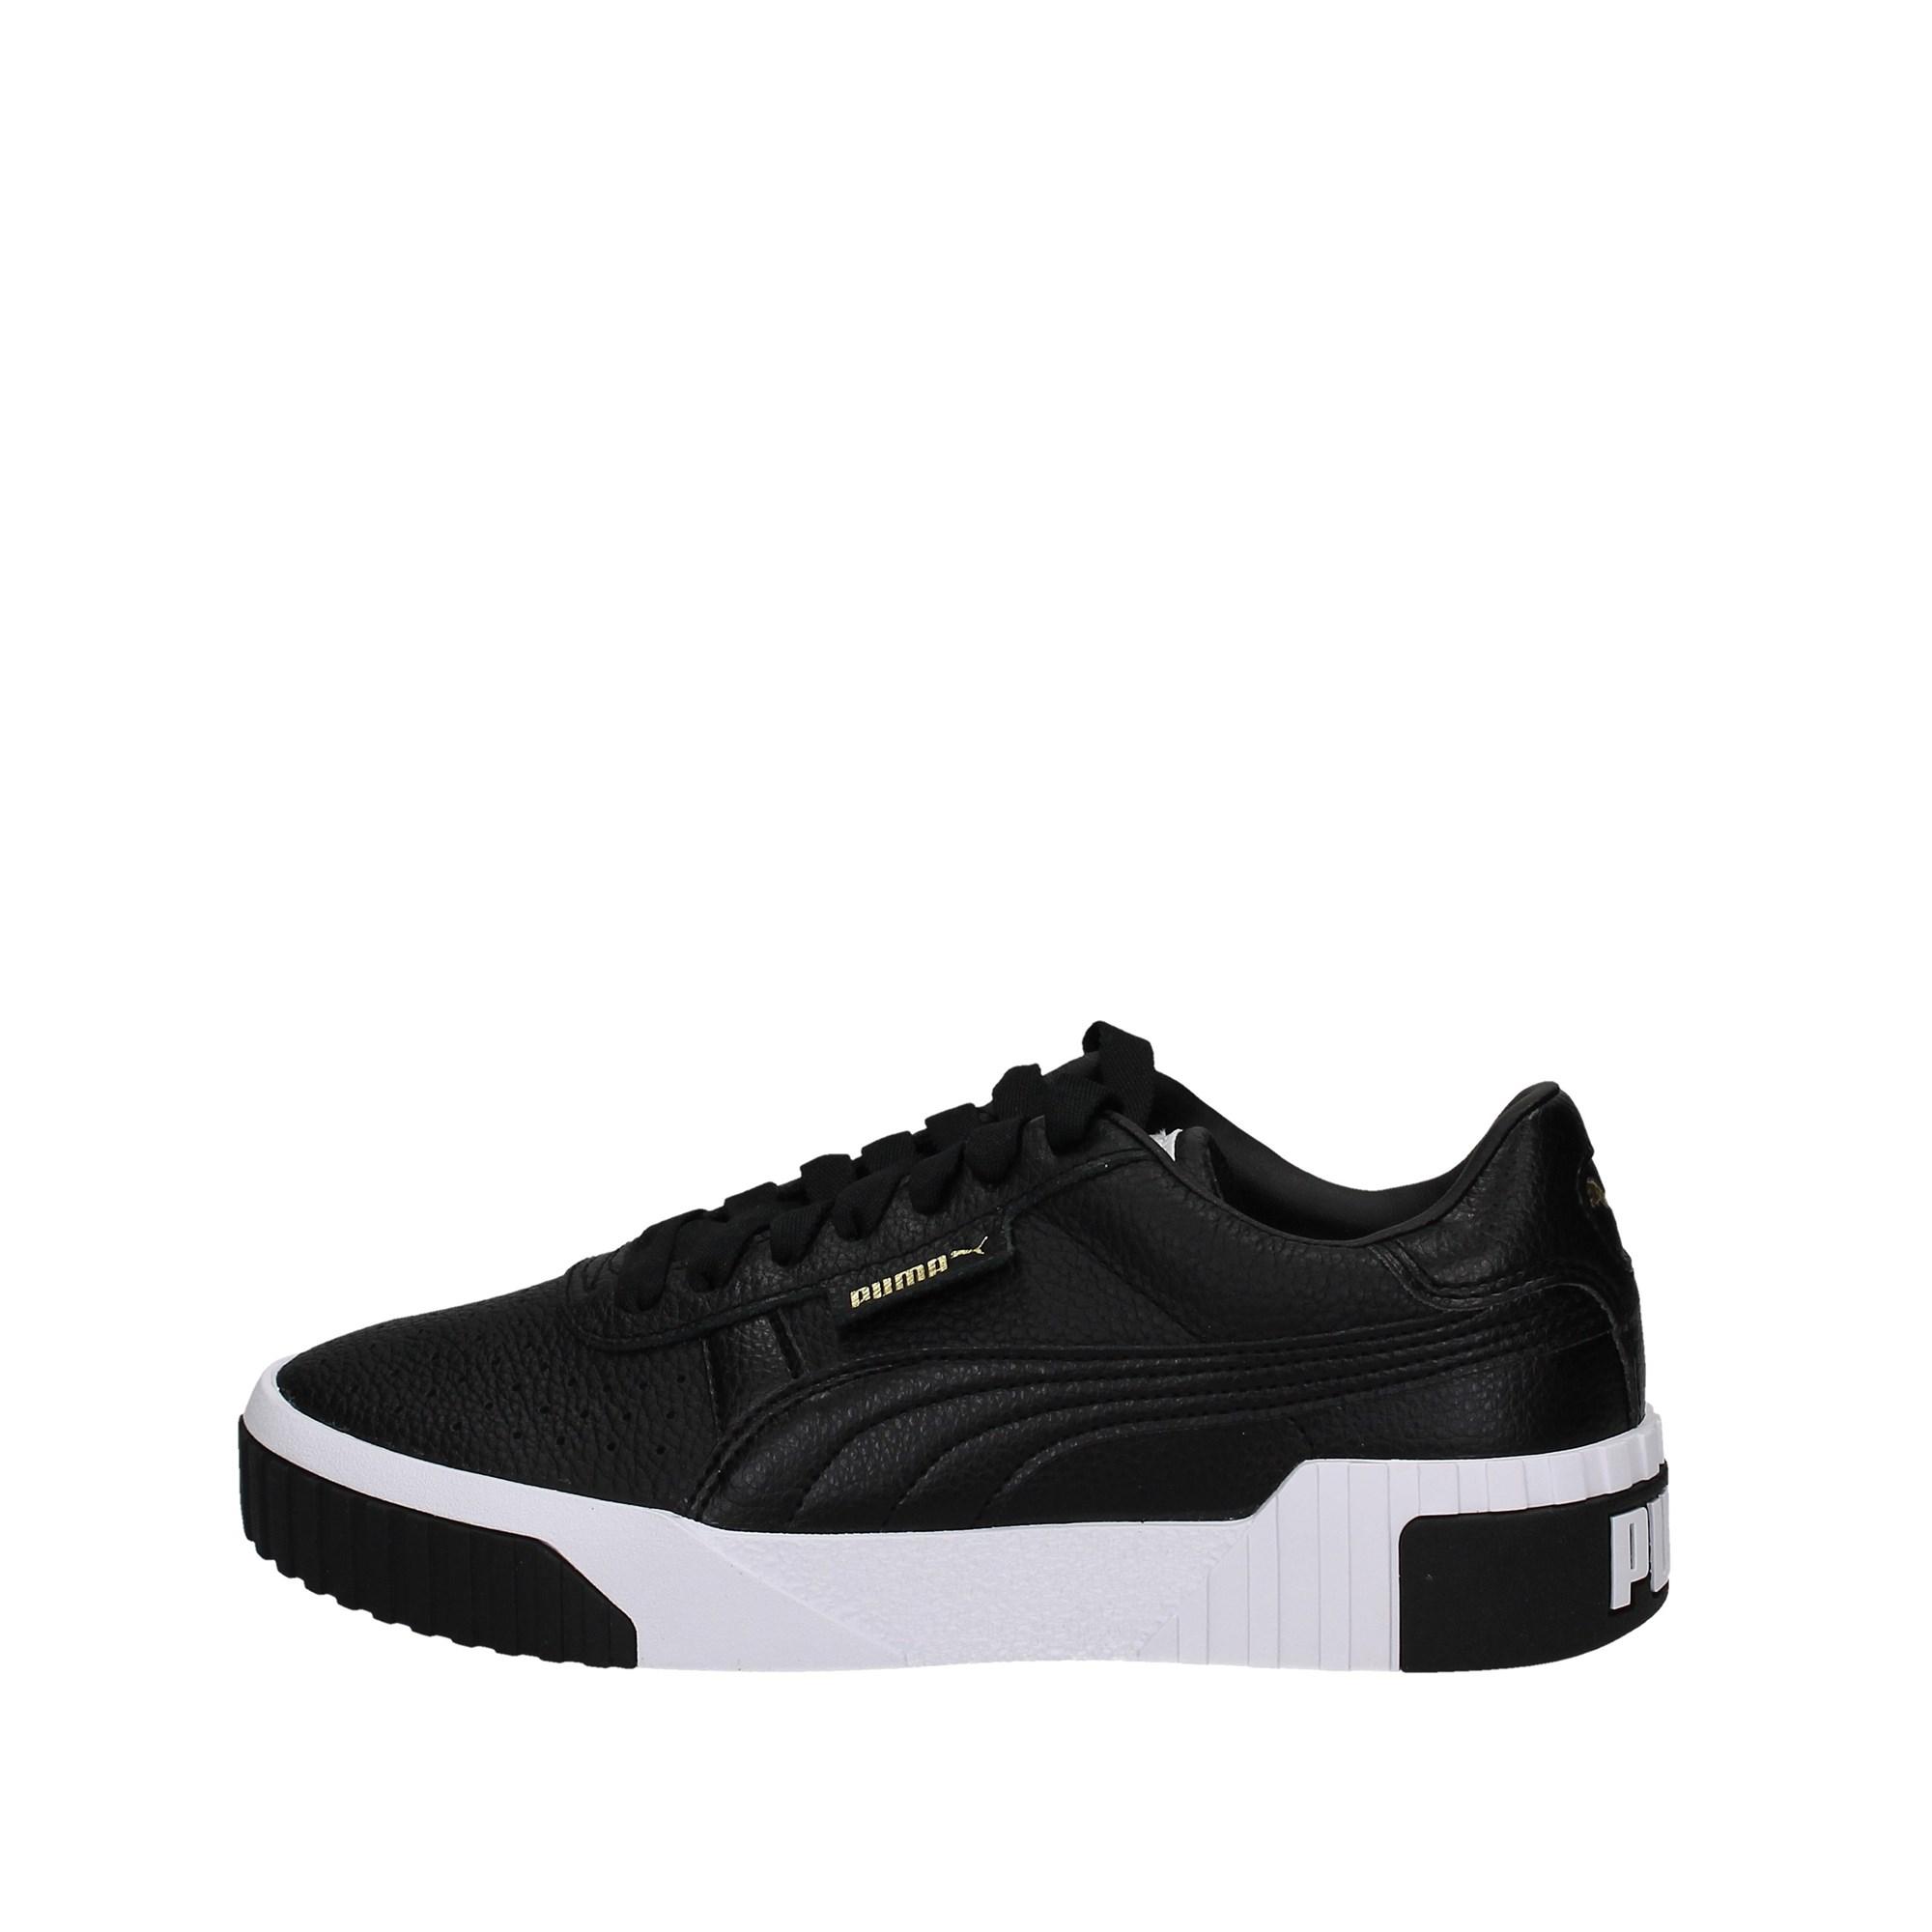 Puma D369155 Nero | Sneaker | Calzature Donna | Principe